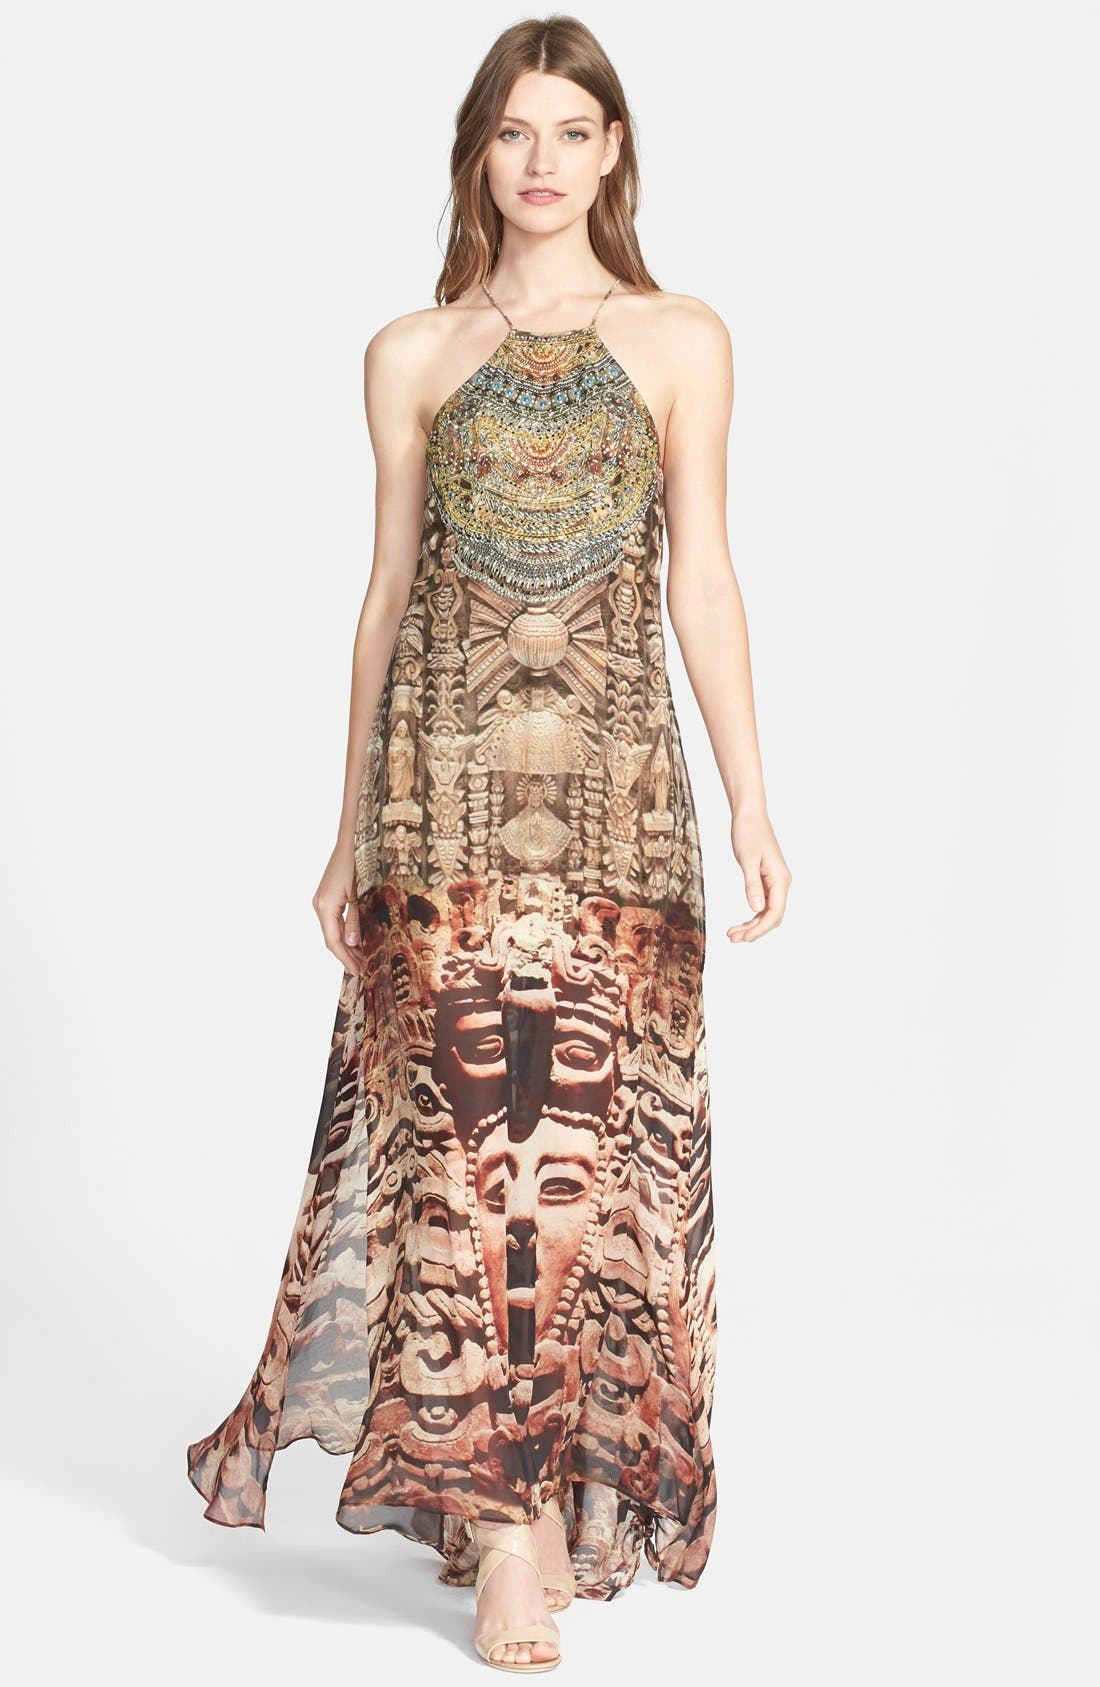 Alternate Image 1 Selected - Camilla 'Time Among the Gods' Crystal Embellished Print Silk Maxi Dress